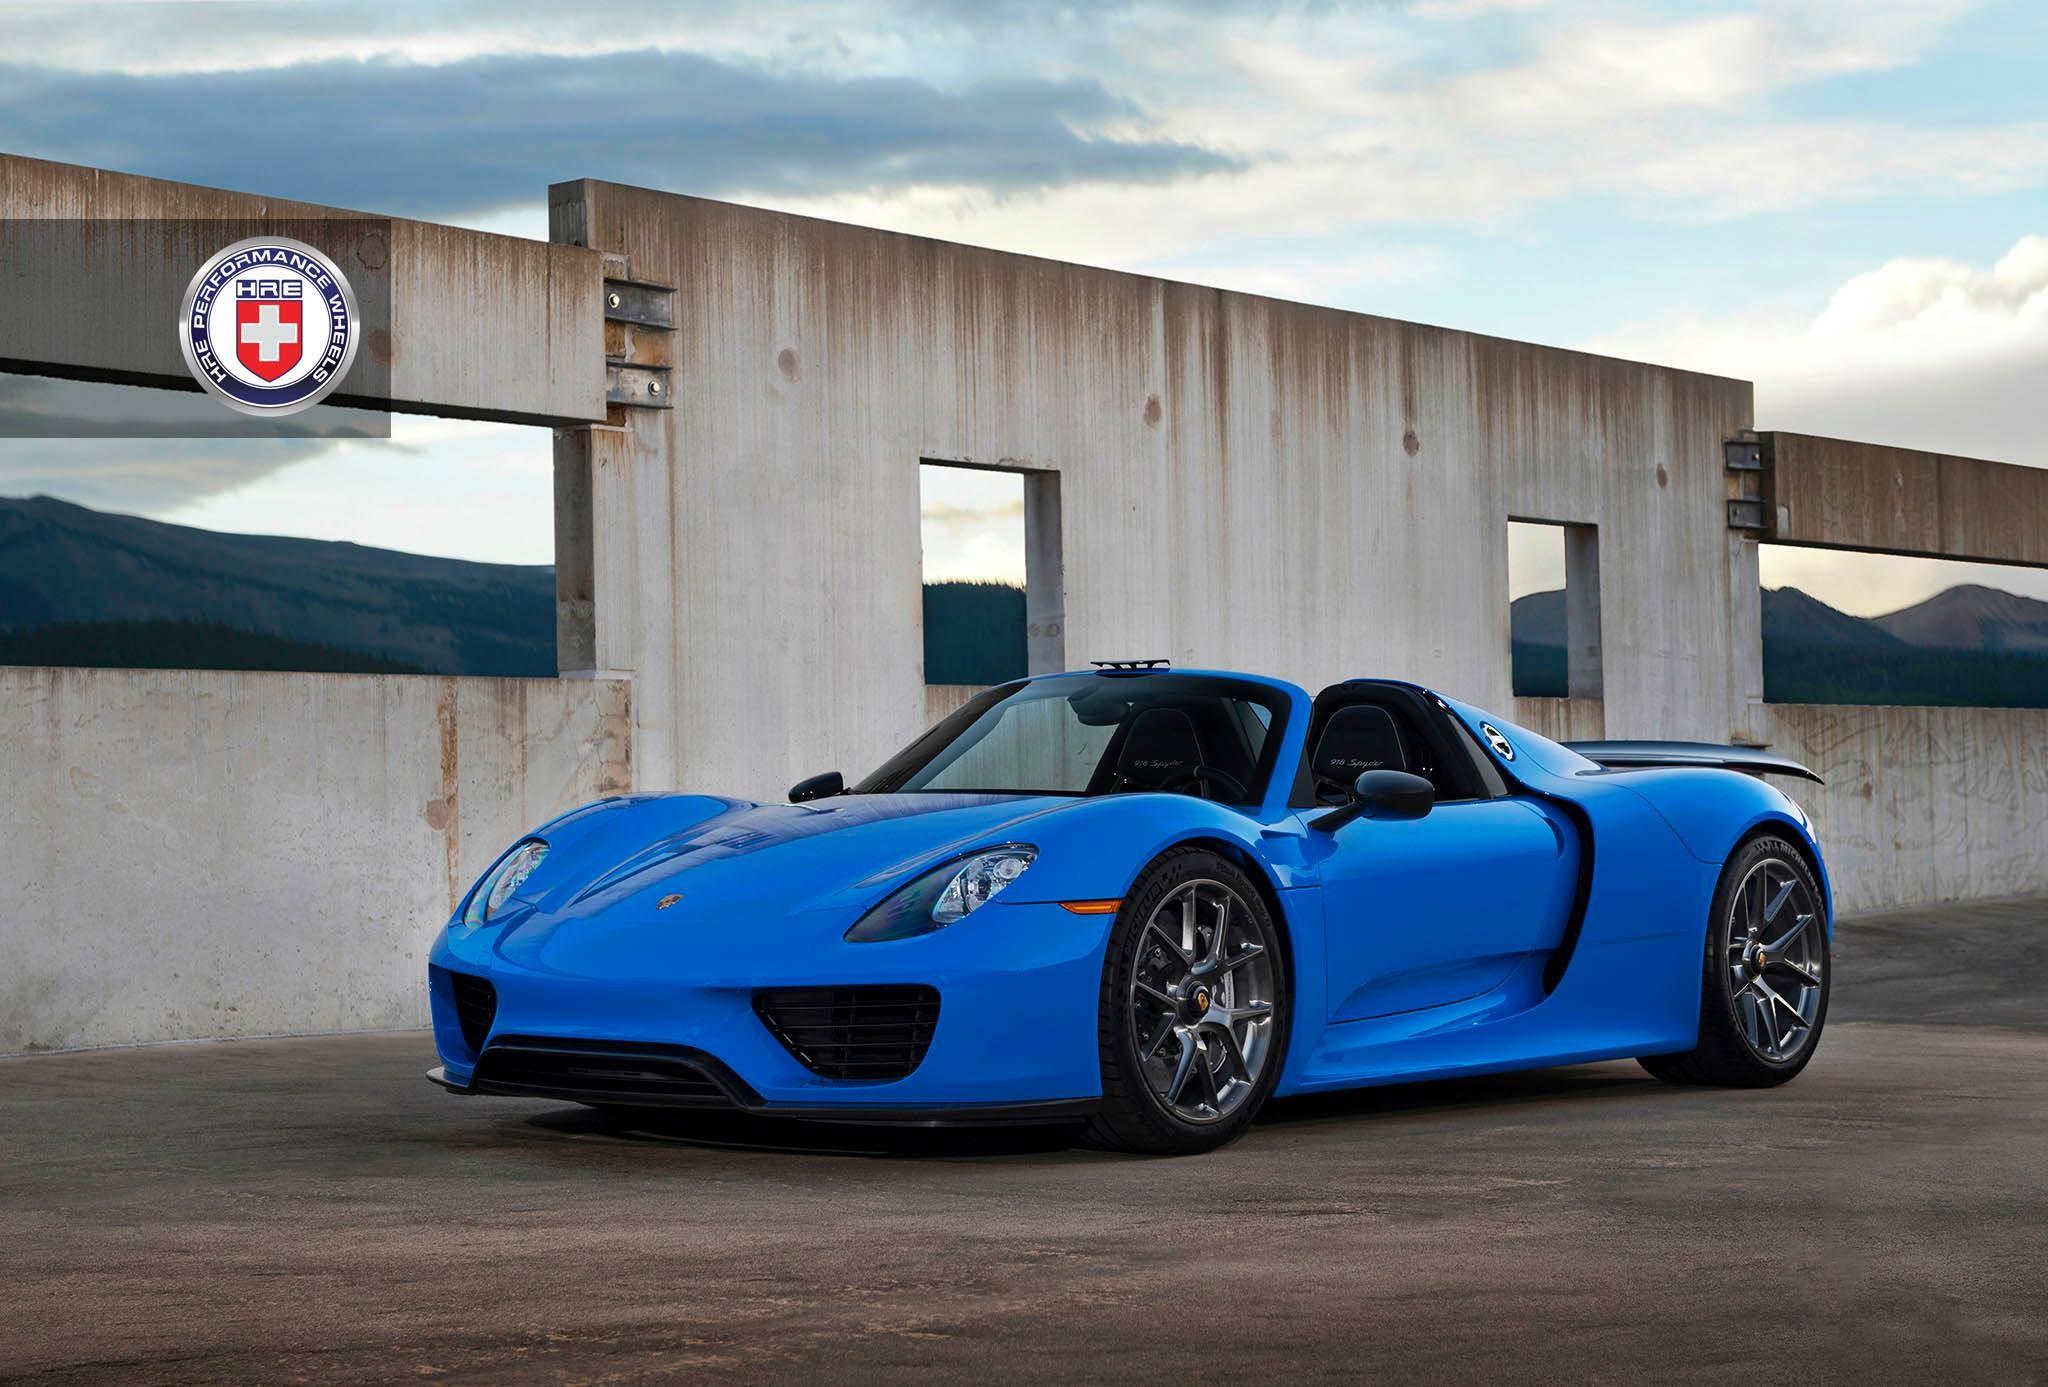 car-sky-vehicle-Porsche-sports-car-German-cars-performance-car-Porsche-Carrera-GT-Porsche-918-Spyder-HRE-Performance-Wheels-wheel-supercar-land-vehicle-automotive-design-automobile-make-luxury-vehicle-47769 Interesting Hinh Anh Xe Porsche 918 Spyder Cars Trend